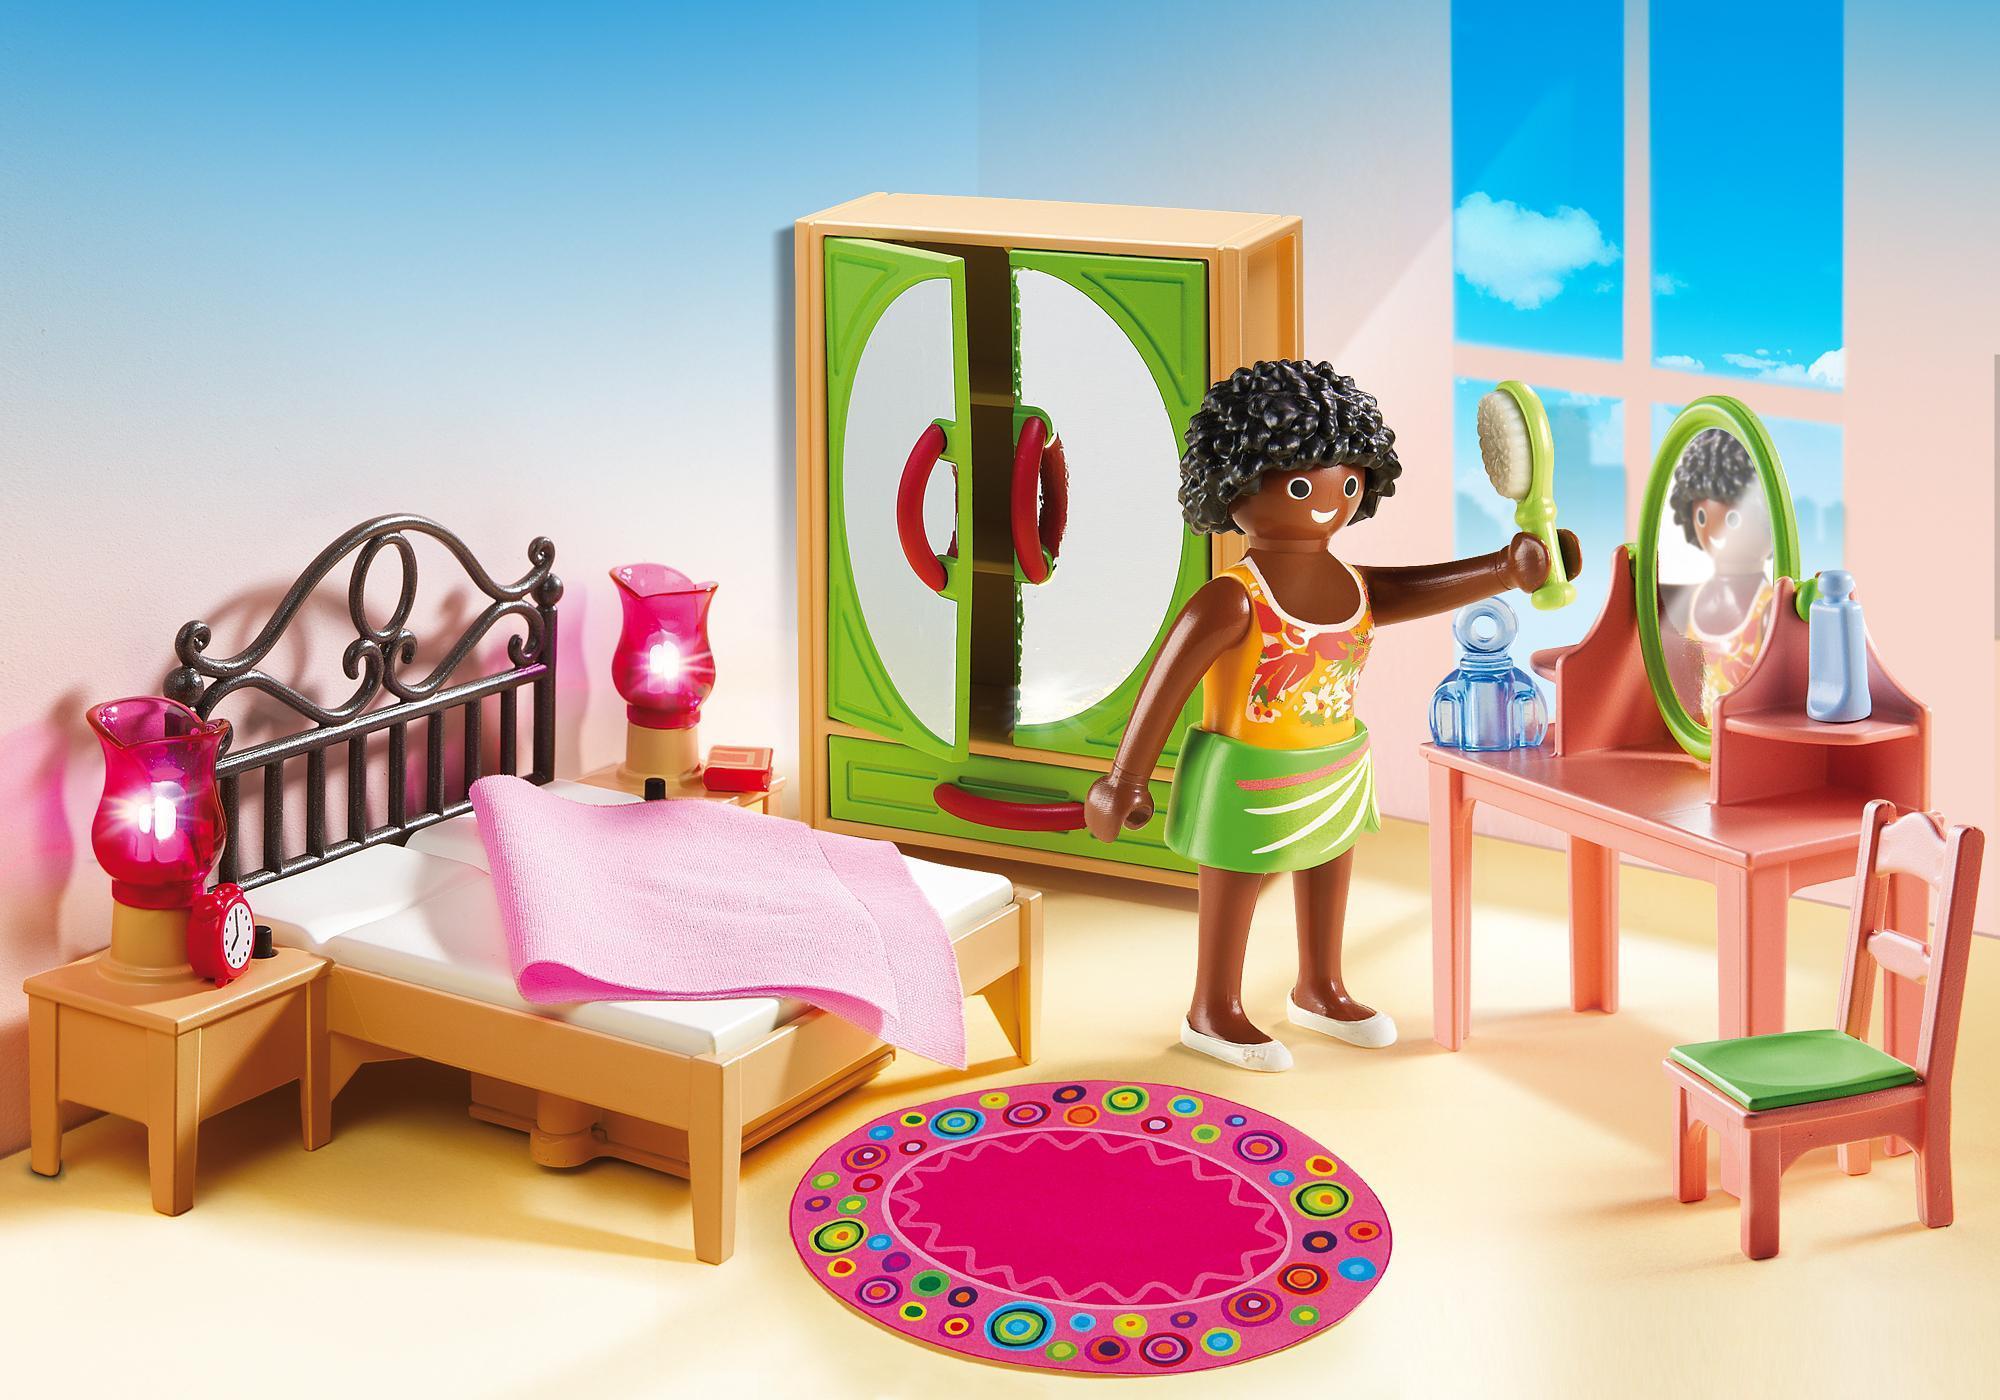 Playmobil koninklijke slaapkamer met hemelbed lego